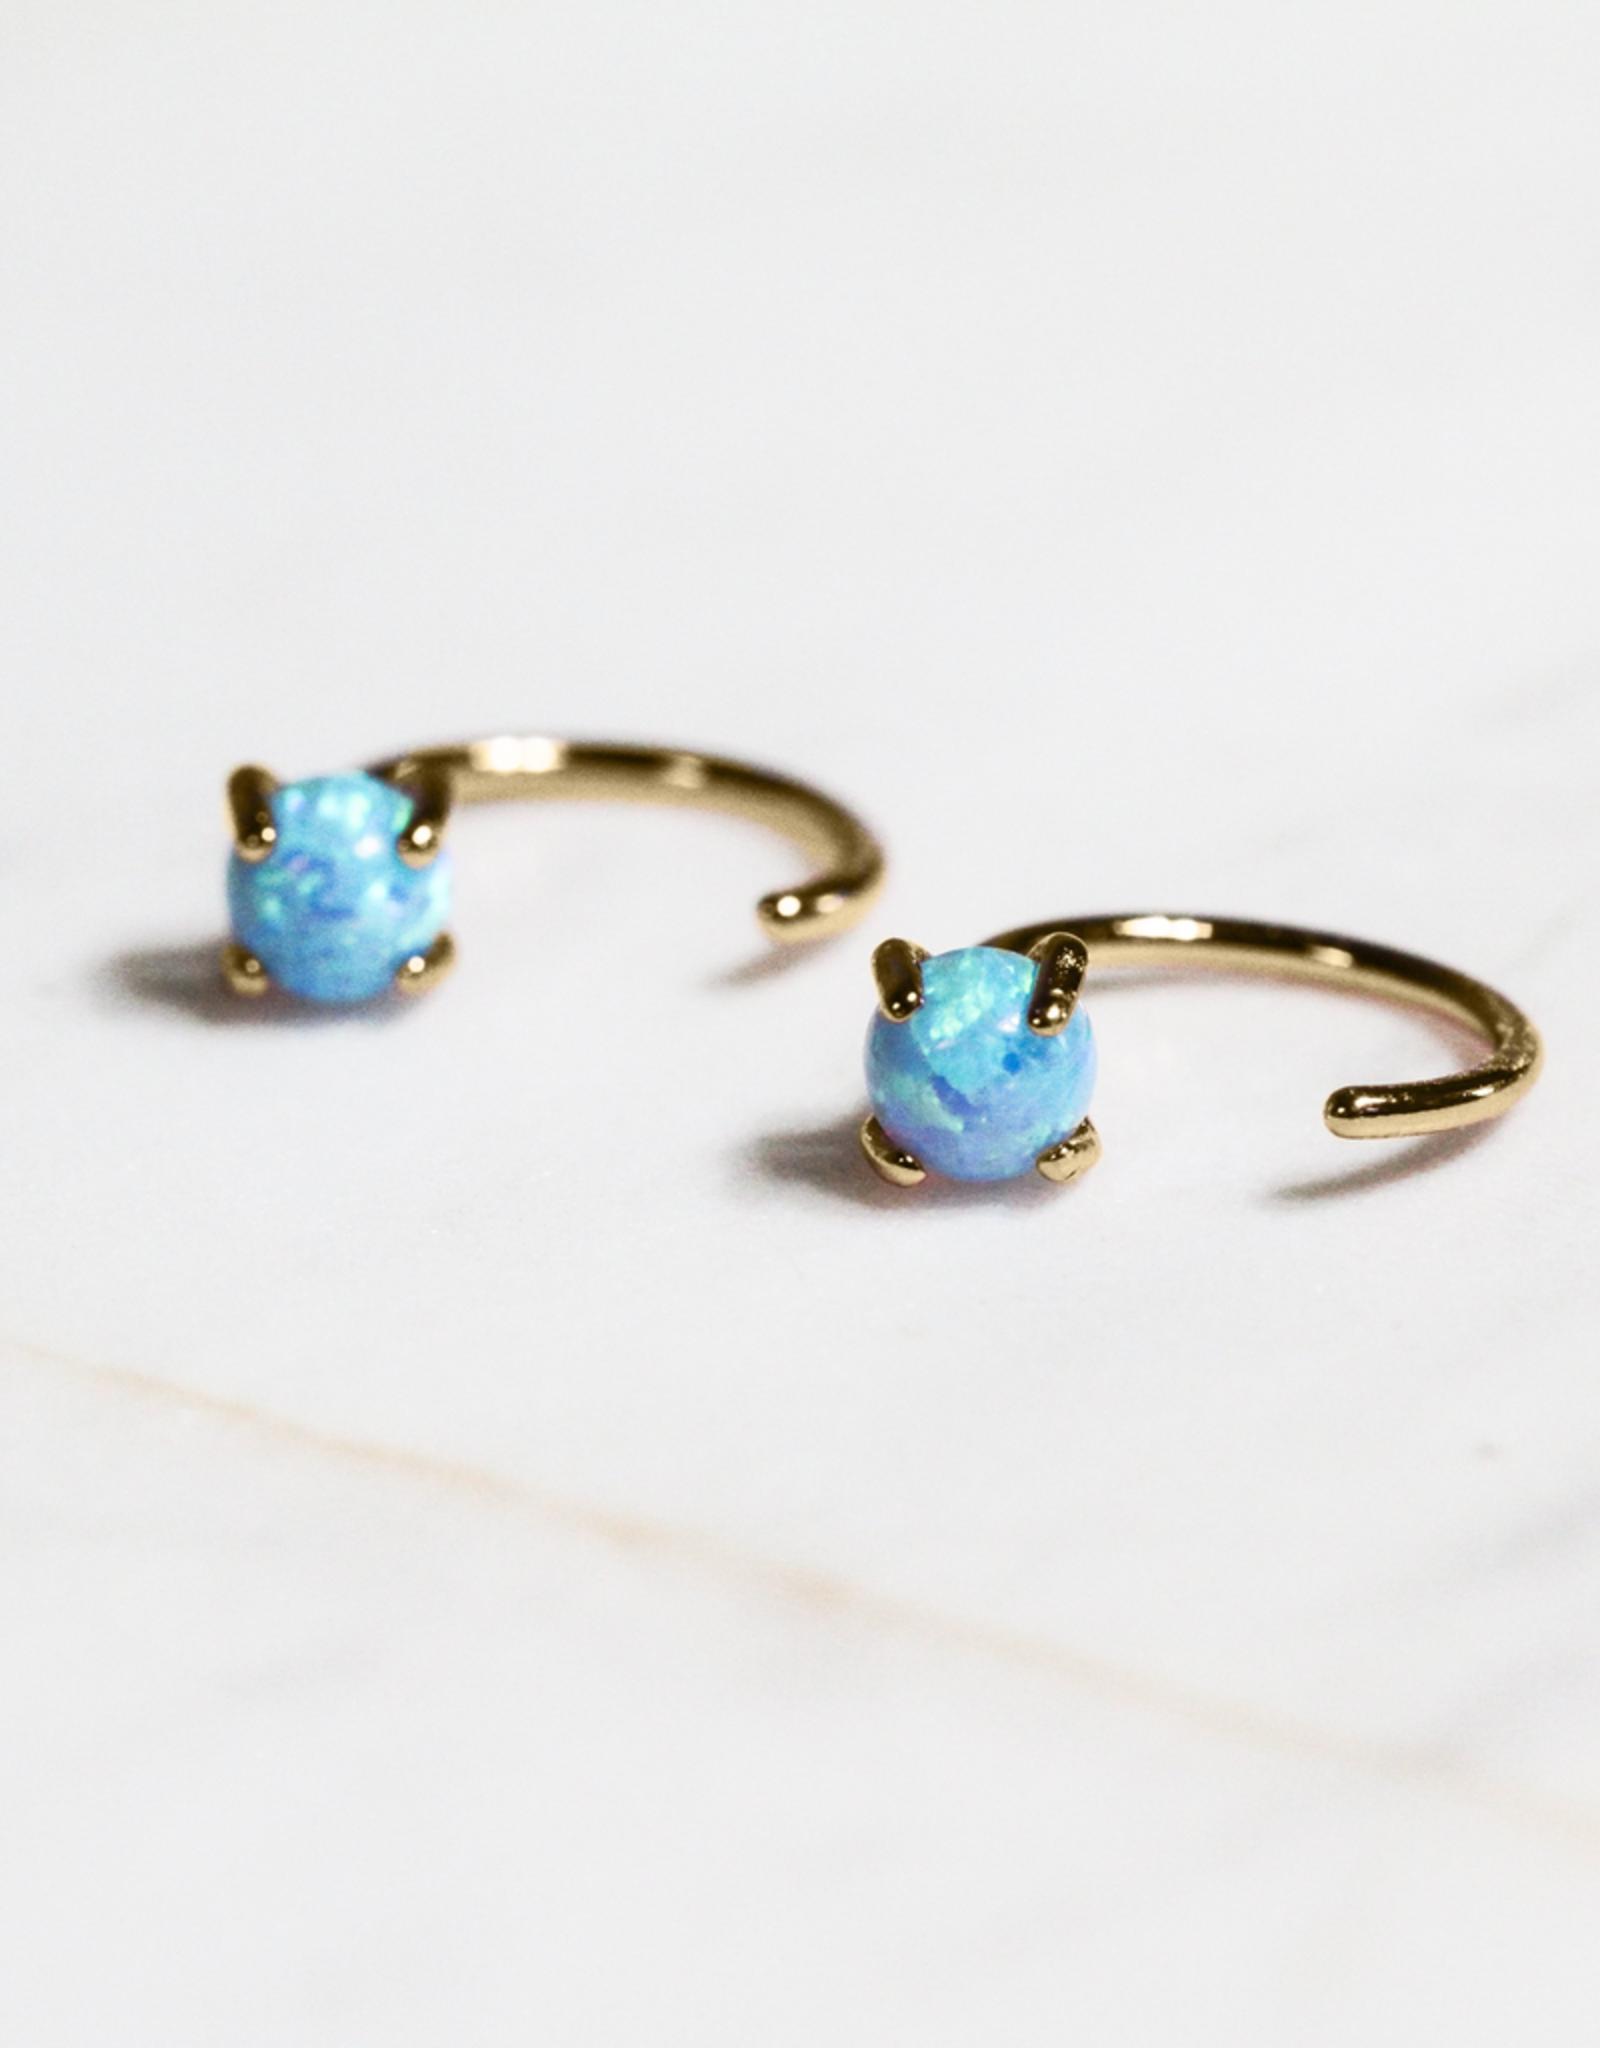 Earrings, Huggie, Opal, Sterling Silver Base with18k Gold Plating